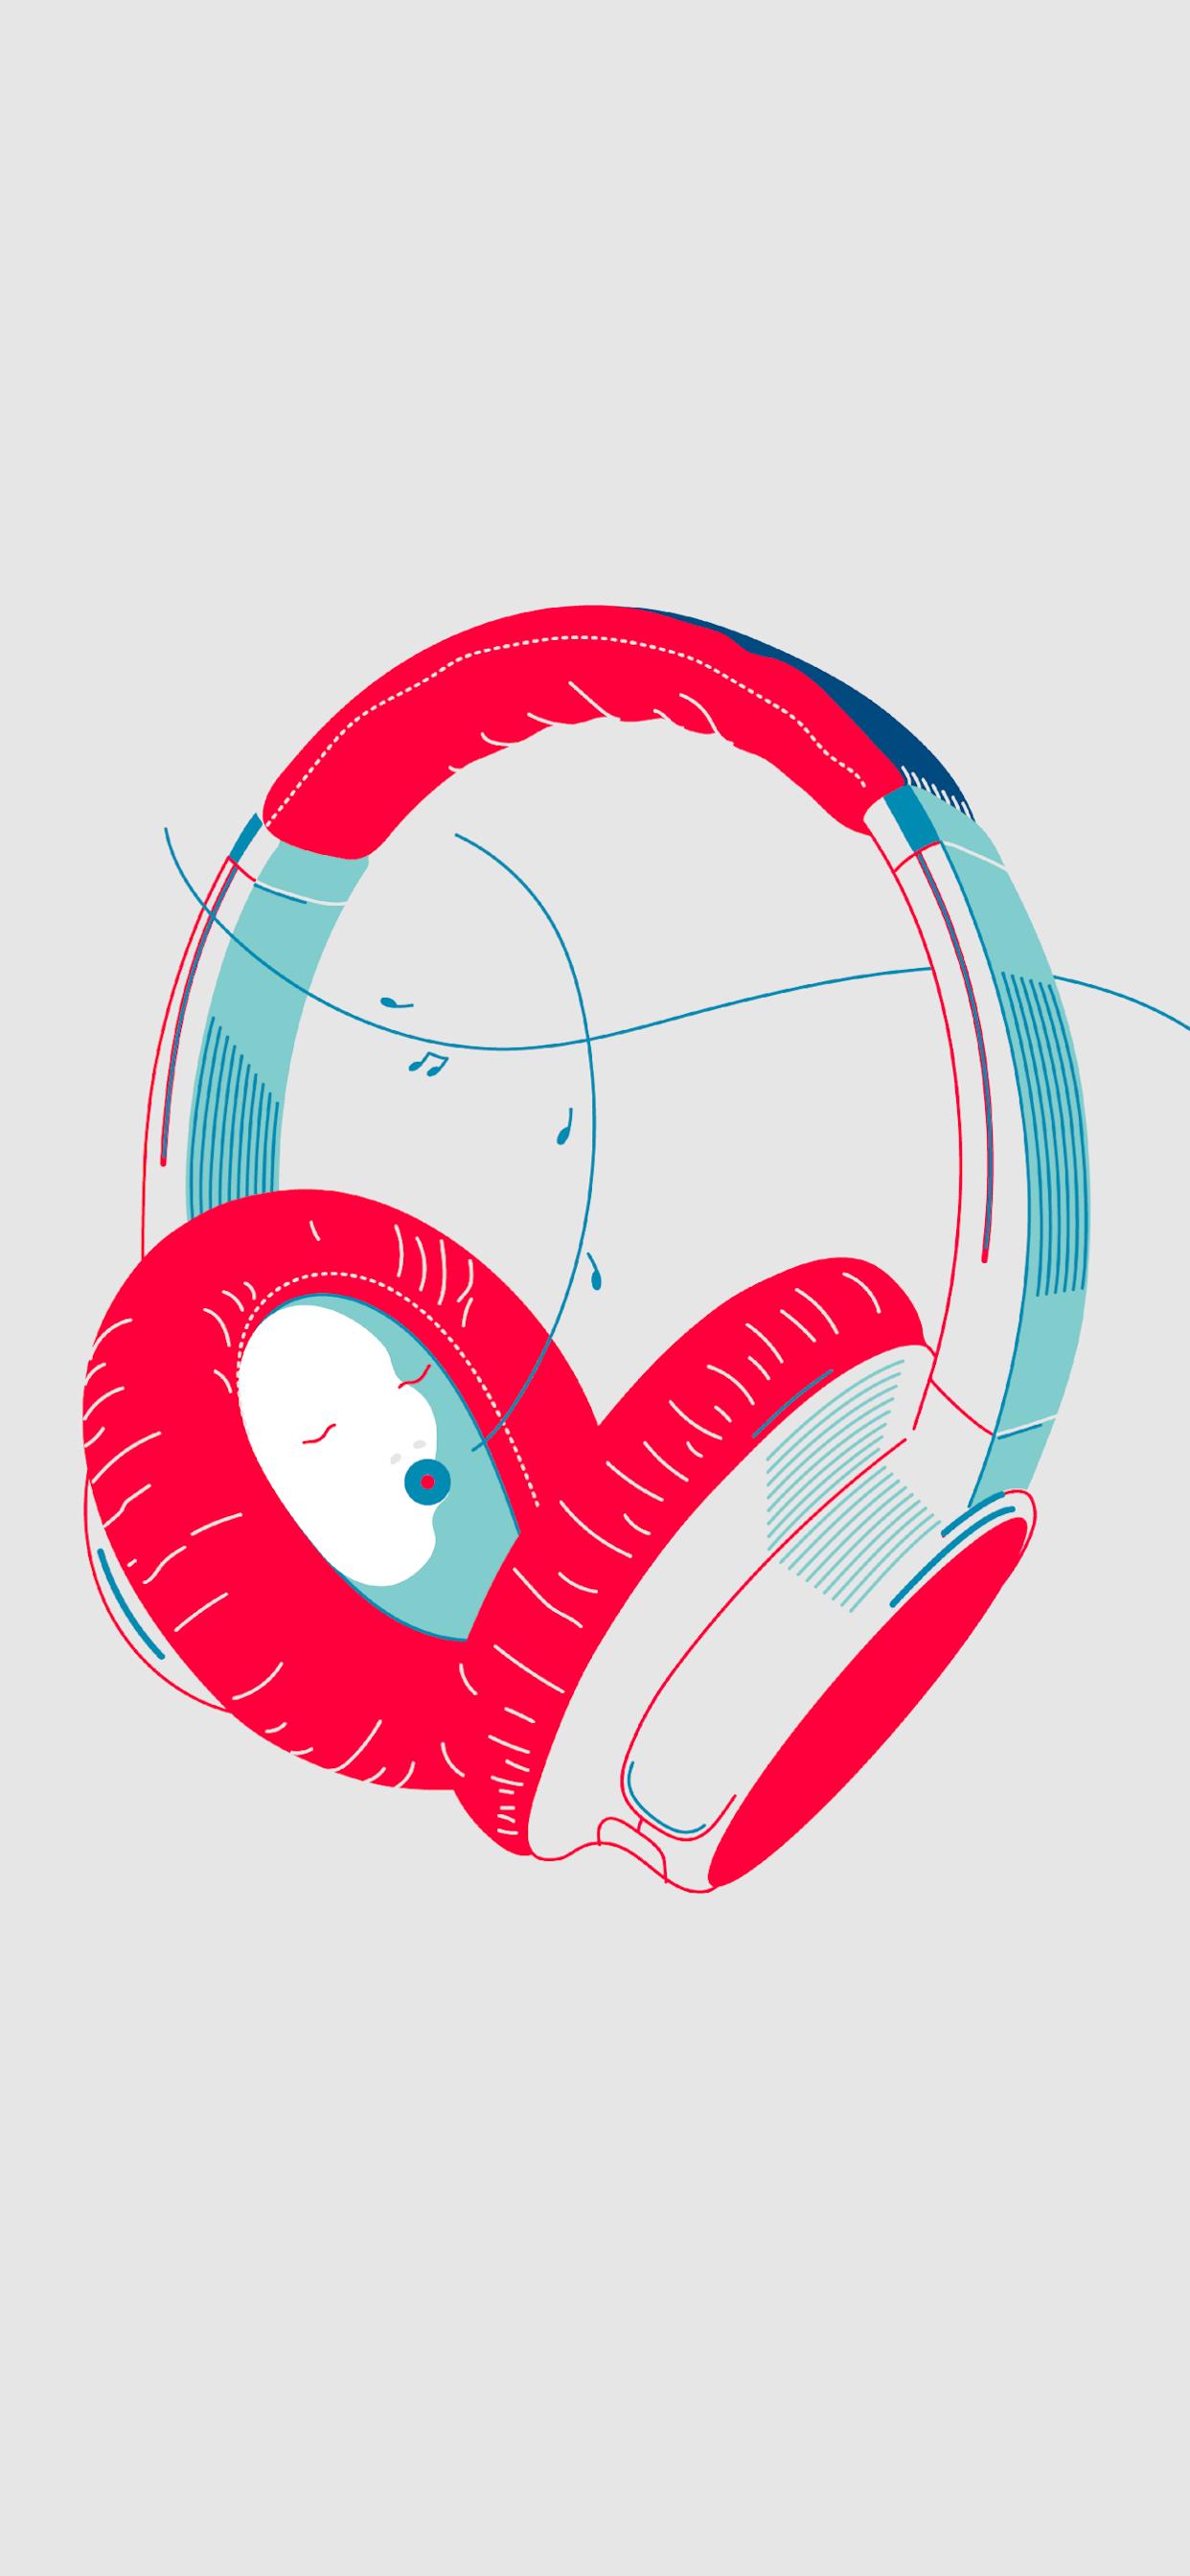 iPhone wallpapers illustration headphones Fonds d'écran iPhone du 02/10/2019